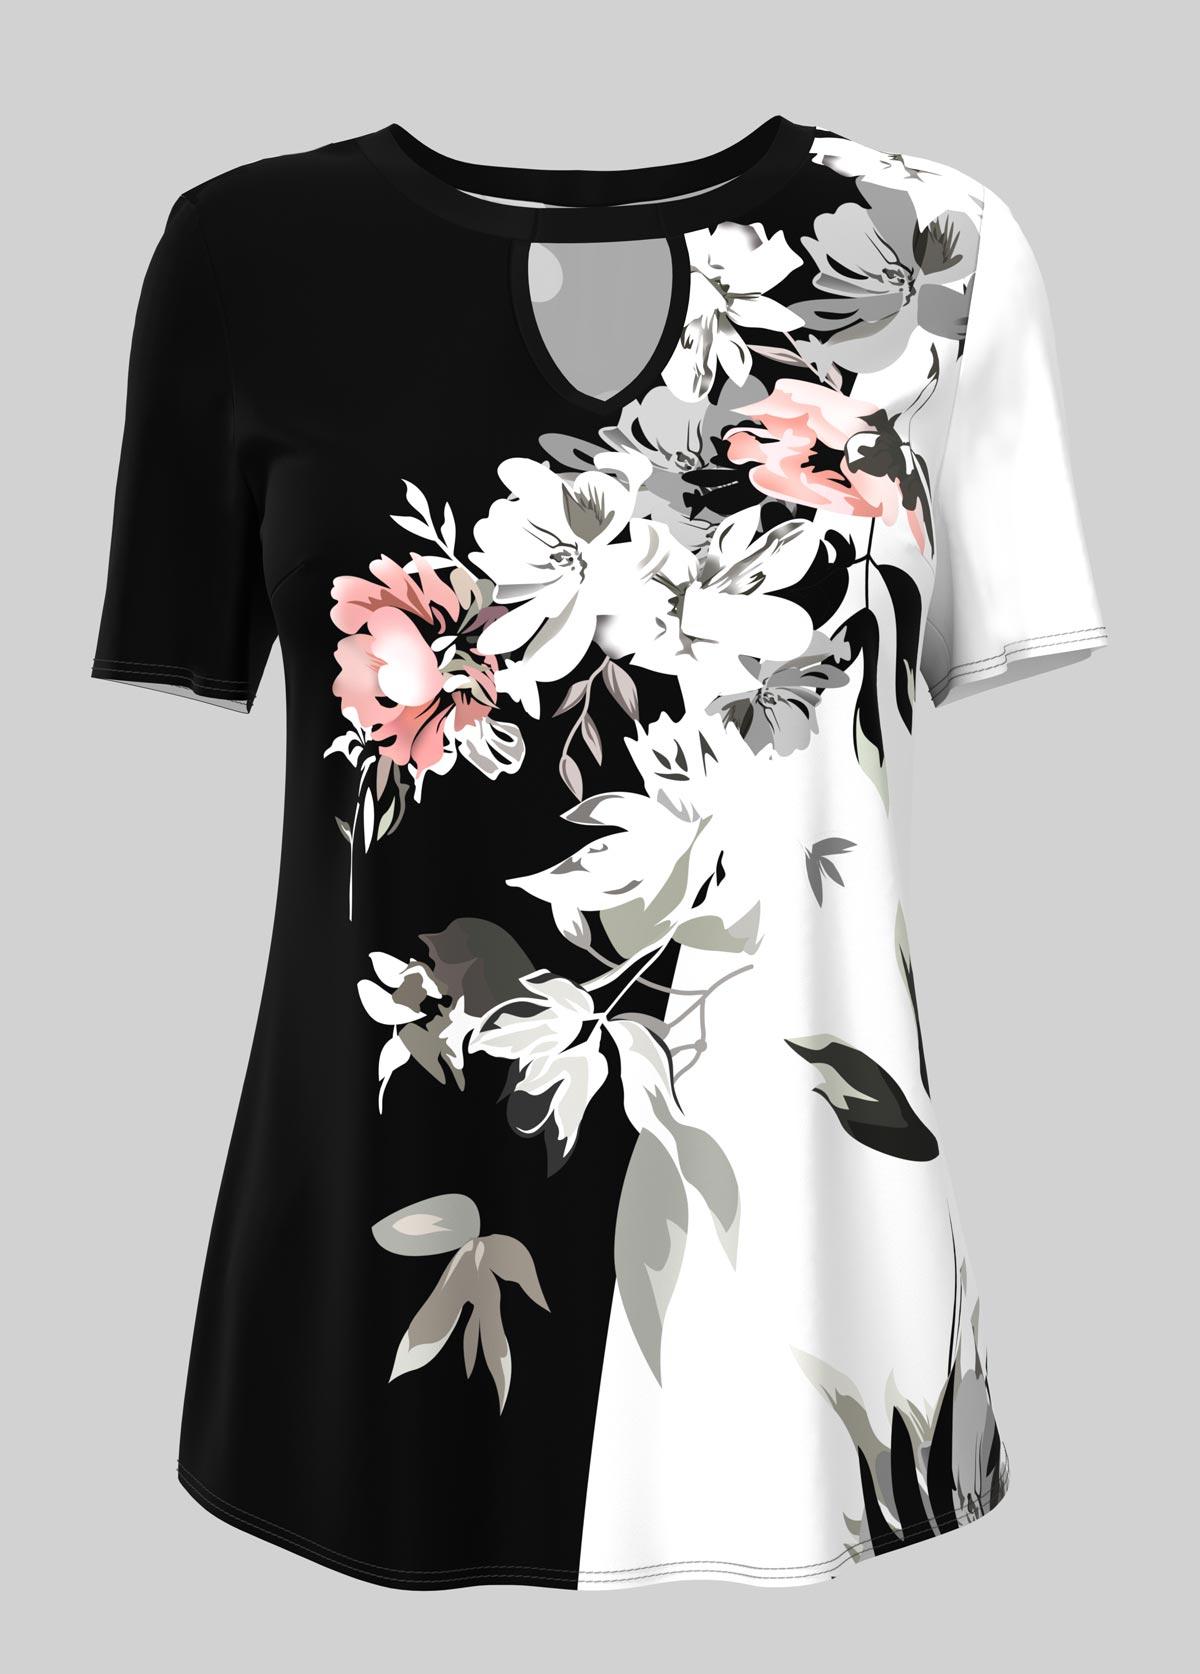 ROTITA Cutout Floral Print Short Sleeve T Shirt